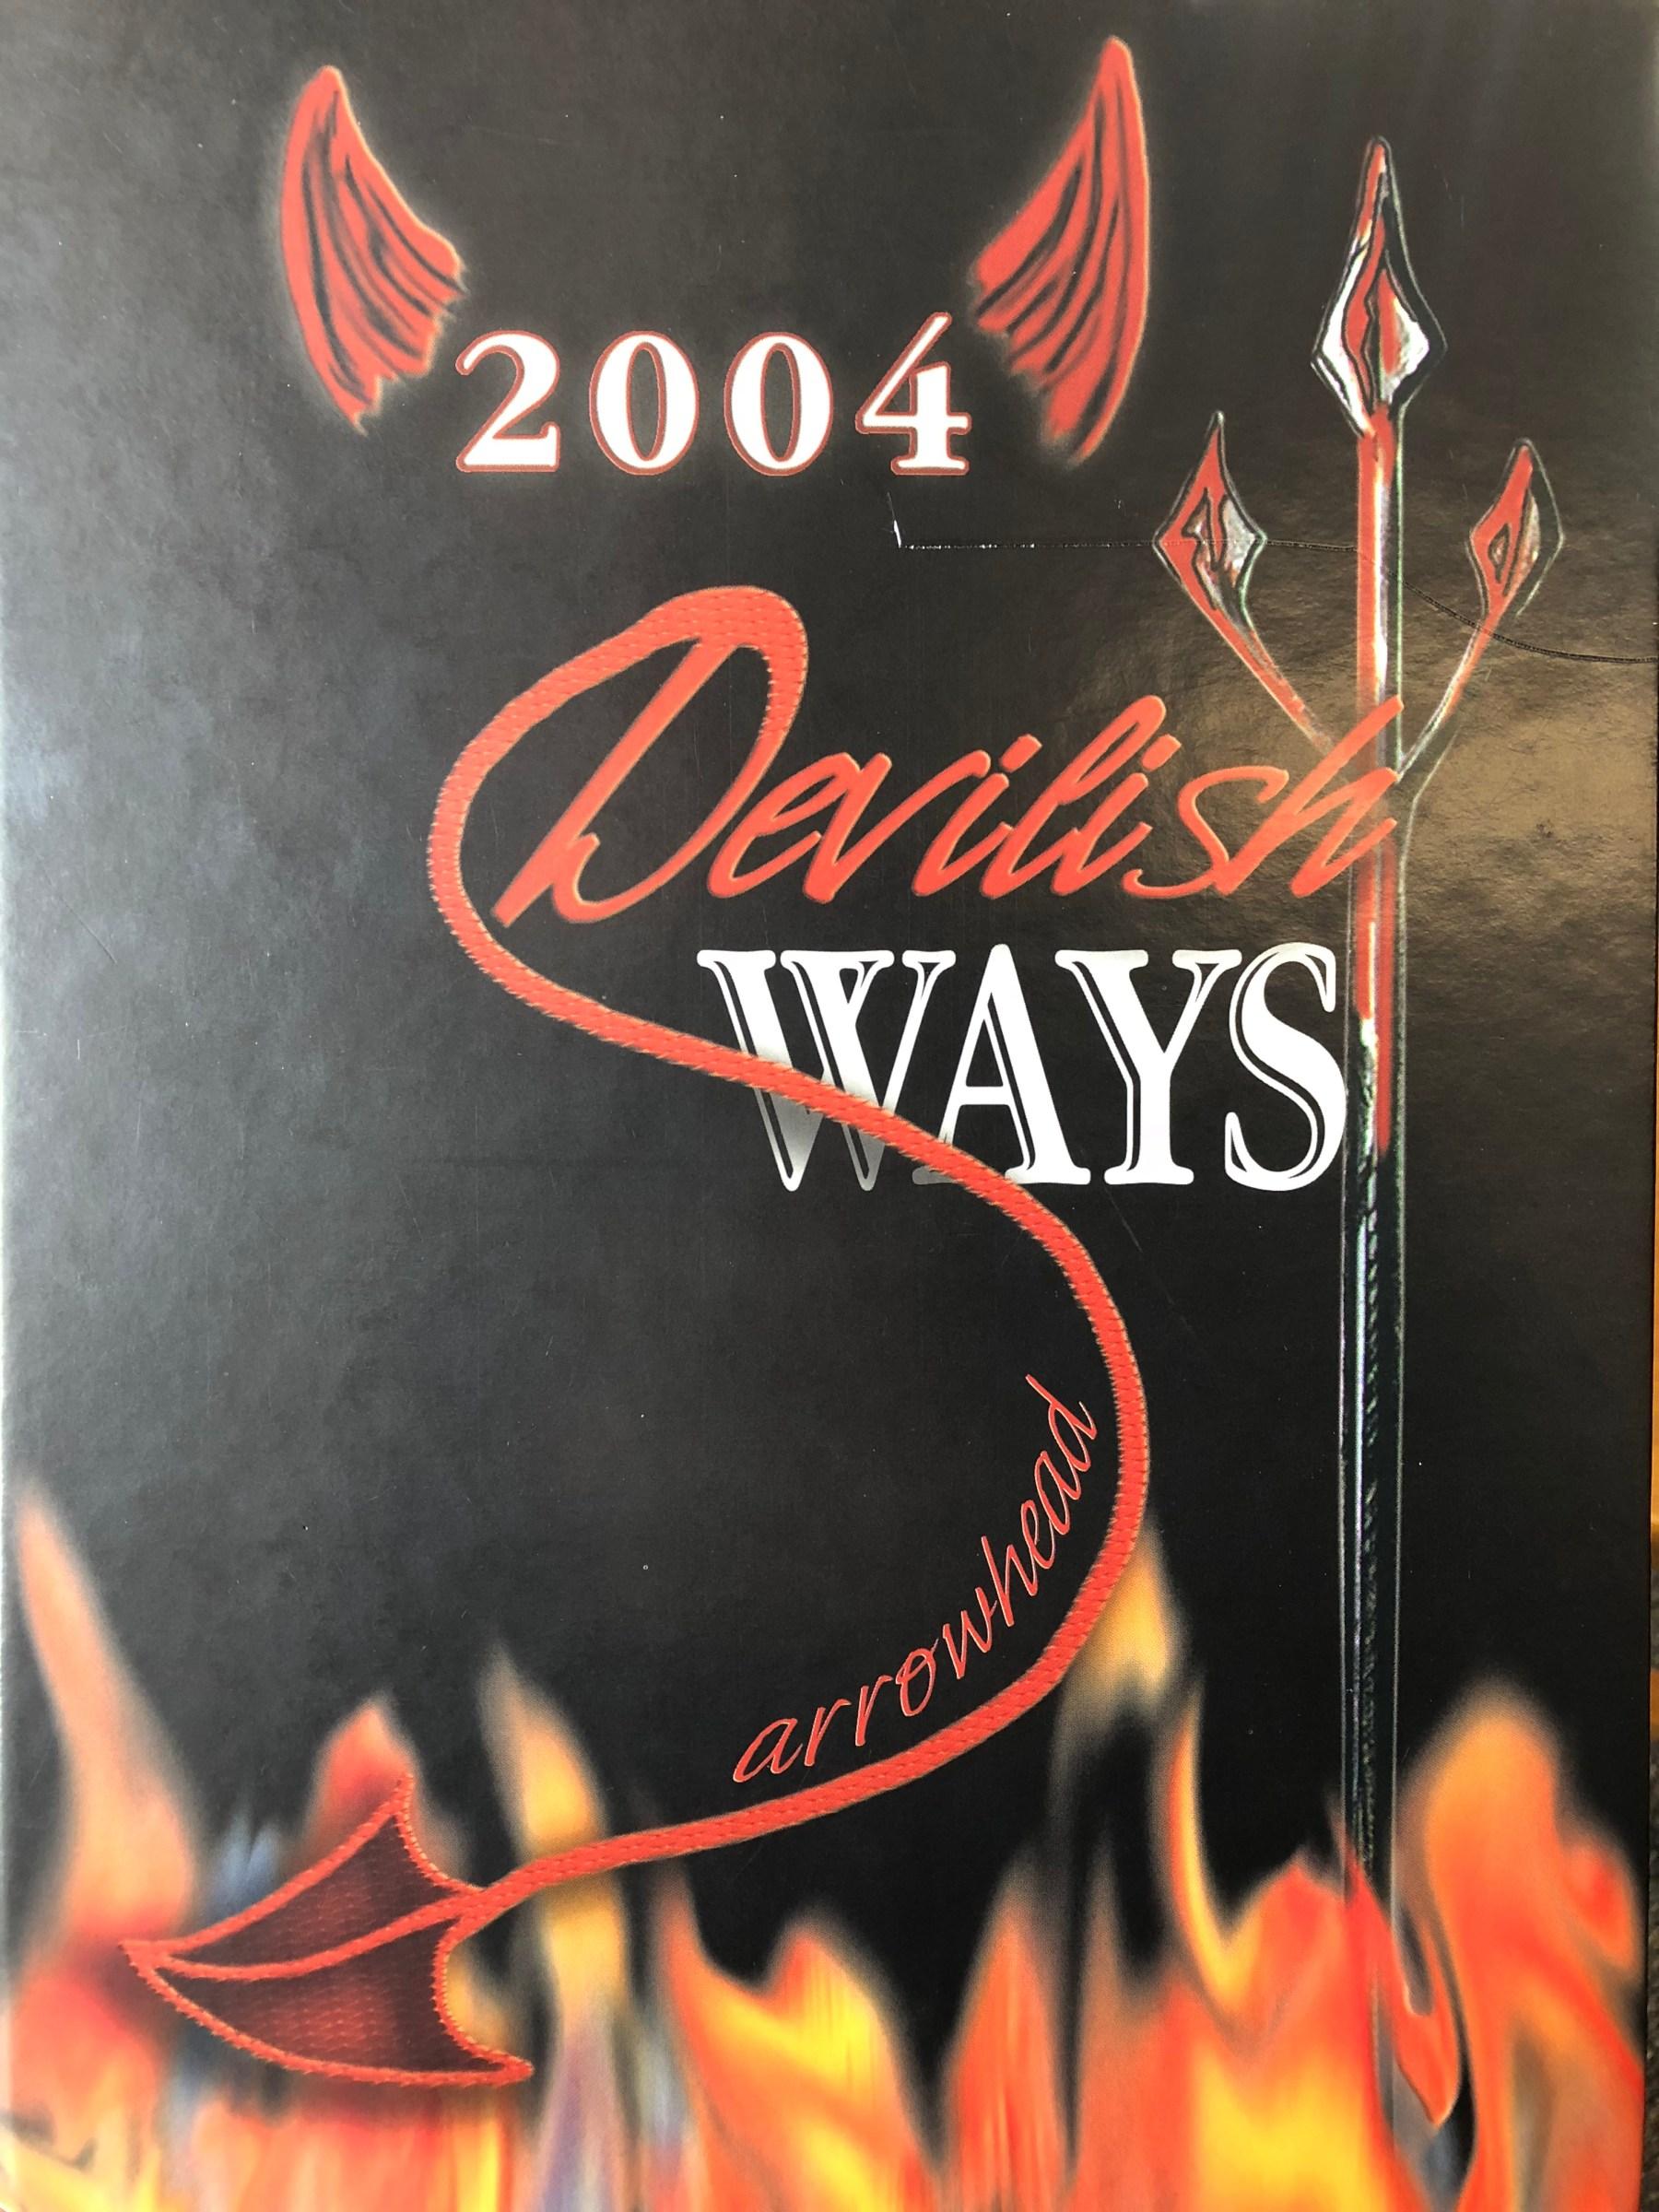 Class of 2004 Burlington MA High School yearbook cover